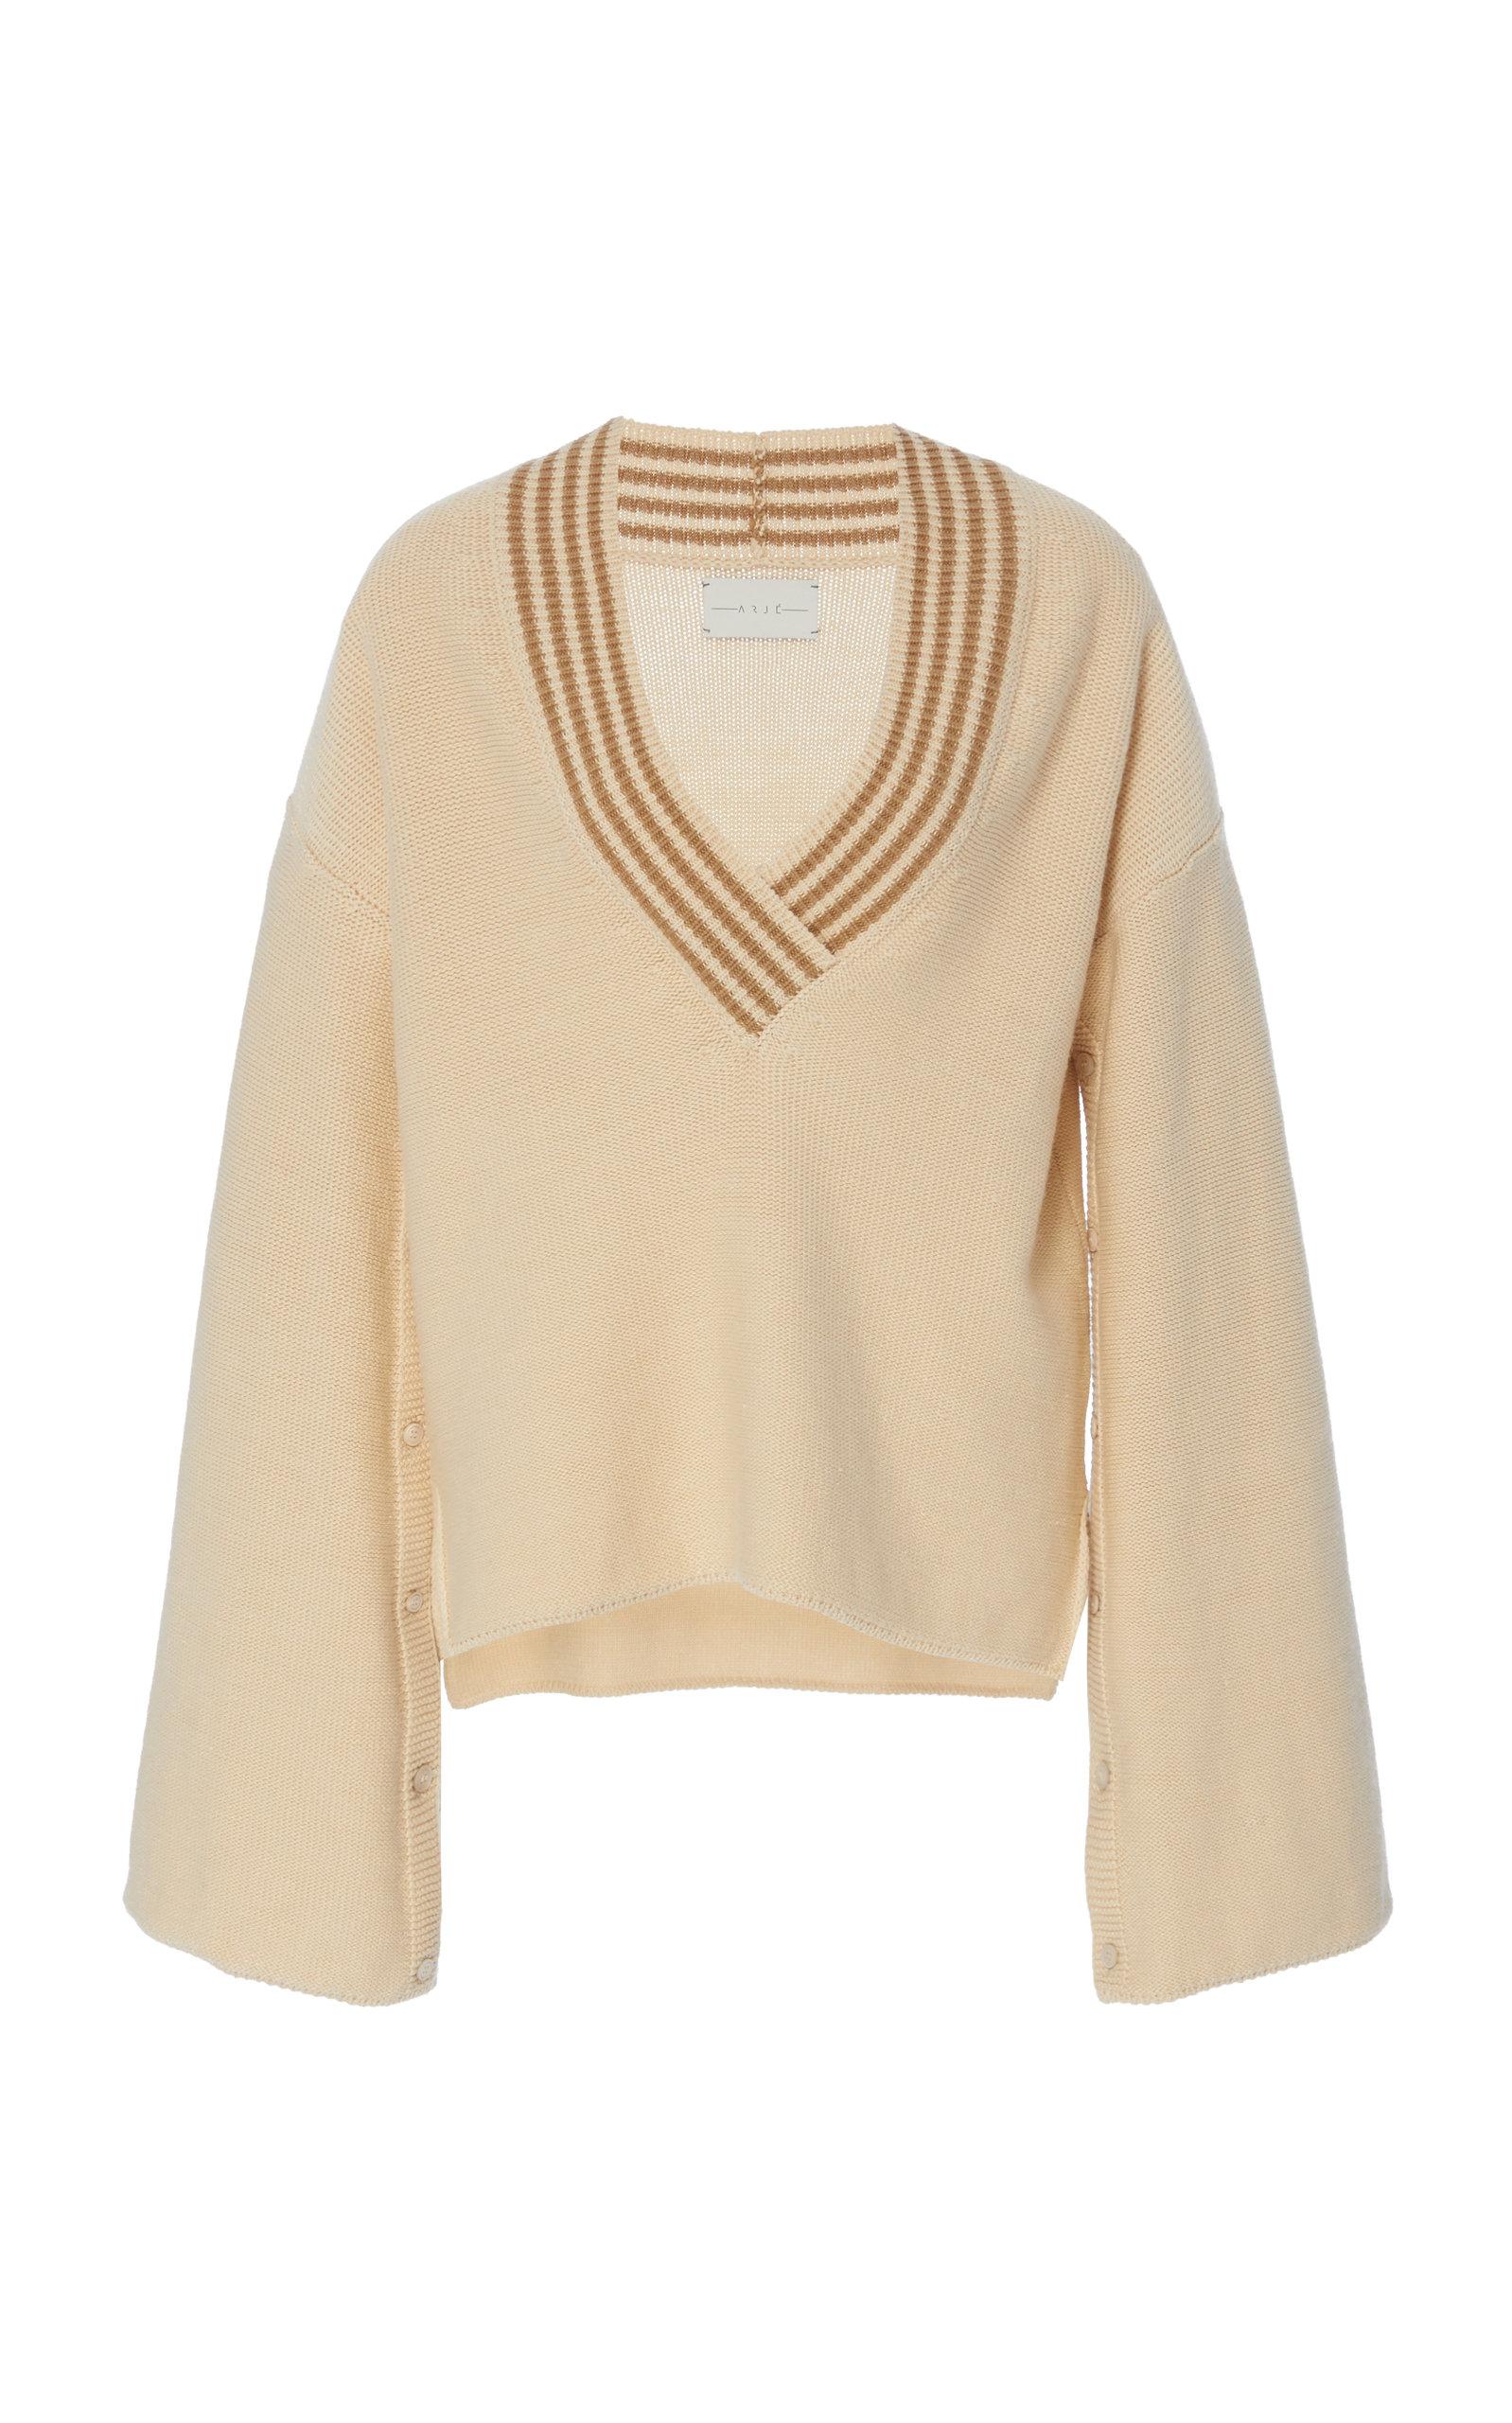 Blend The Neck Sweater V Arje White Wool Formantera In zTpq11Xx